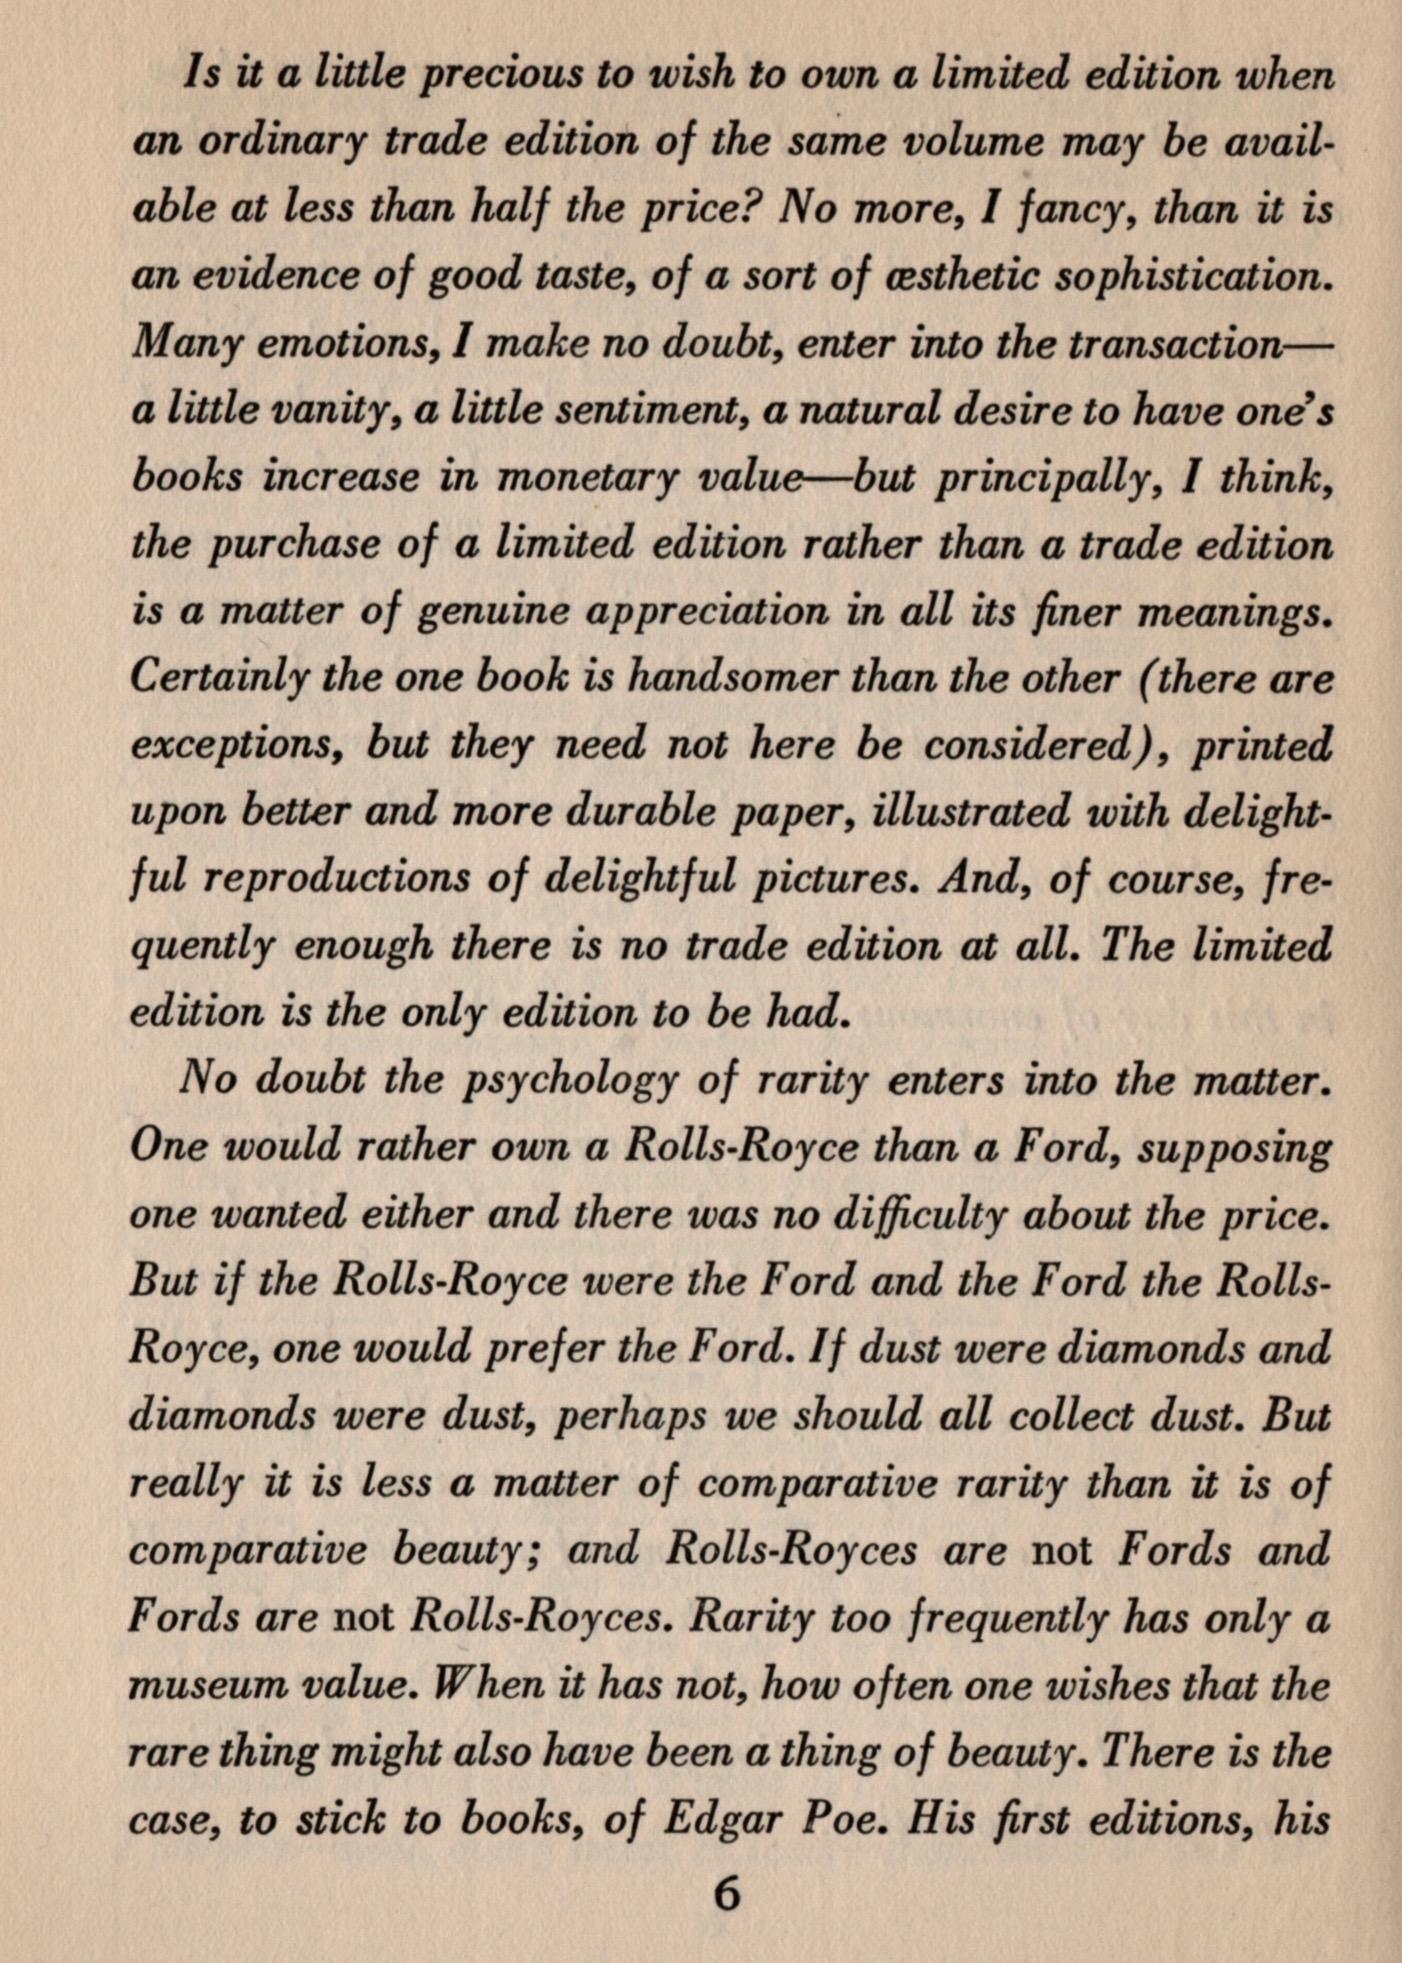 Covici Friede catalogue 1929 Page 4.jpeg